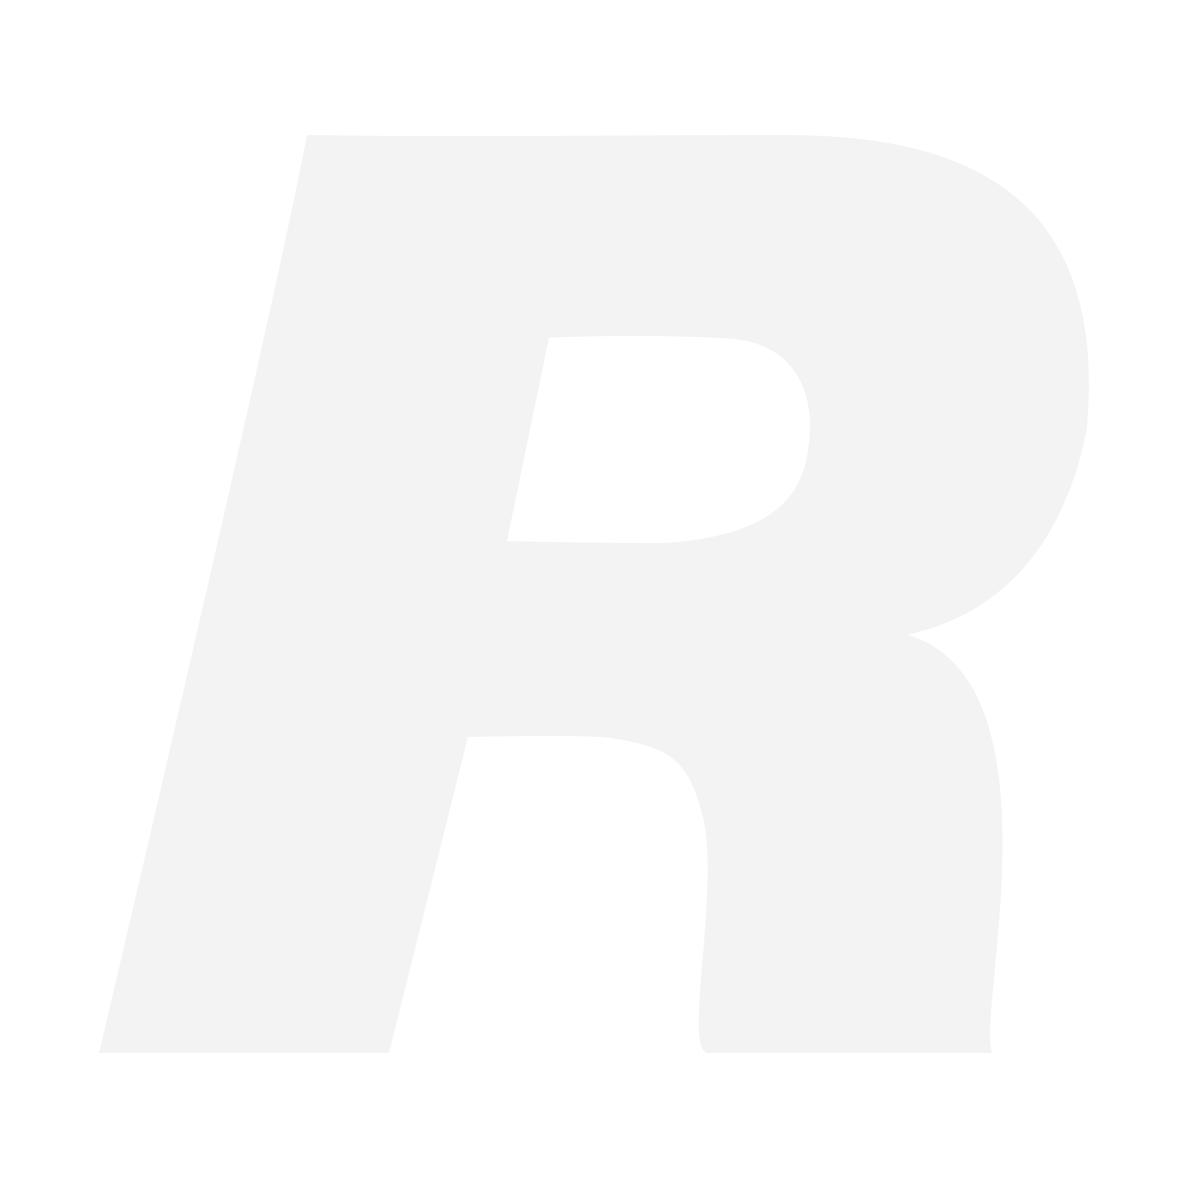 Rode Dead Cat windshield (NTG-1, NTG-2, NTG-3, VideoMic Rycote)